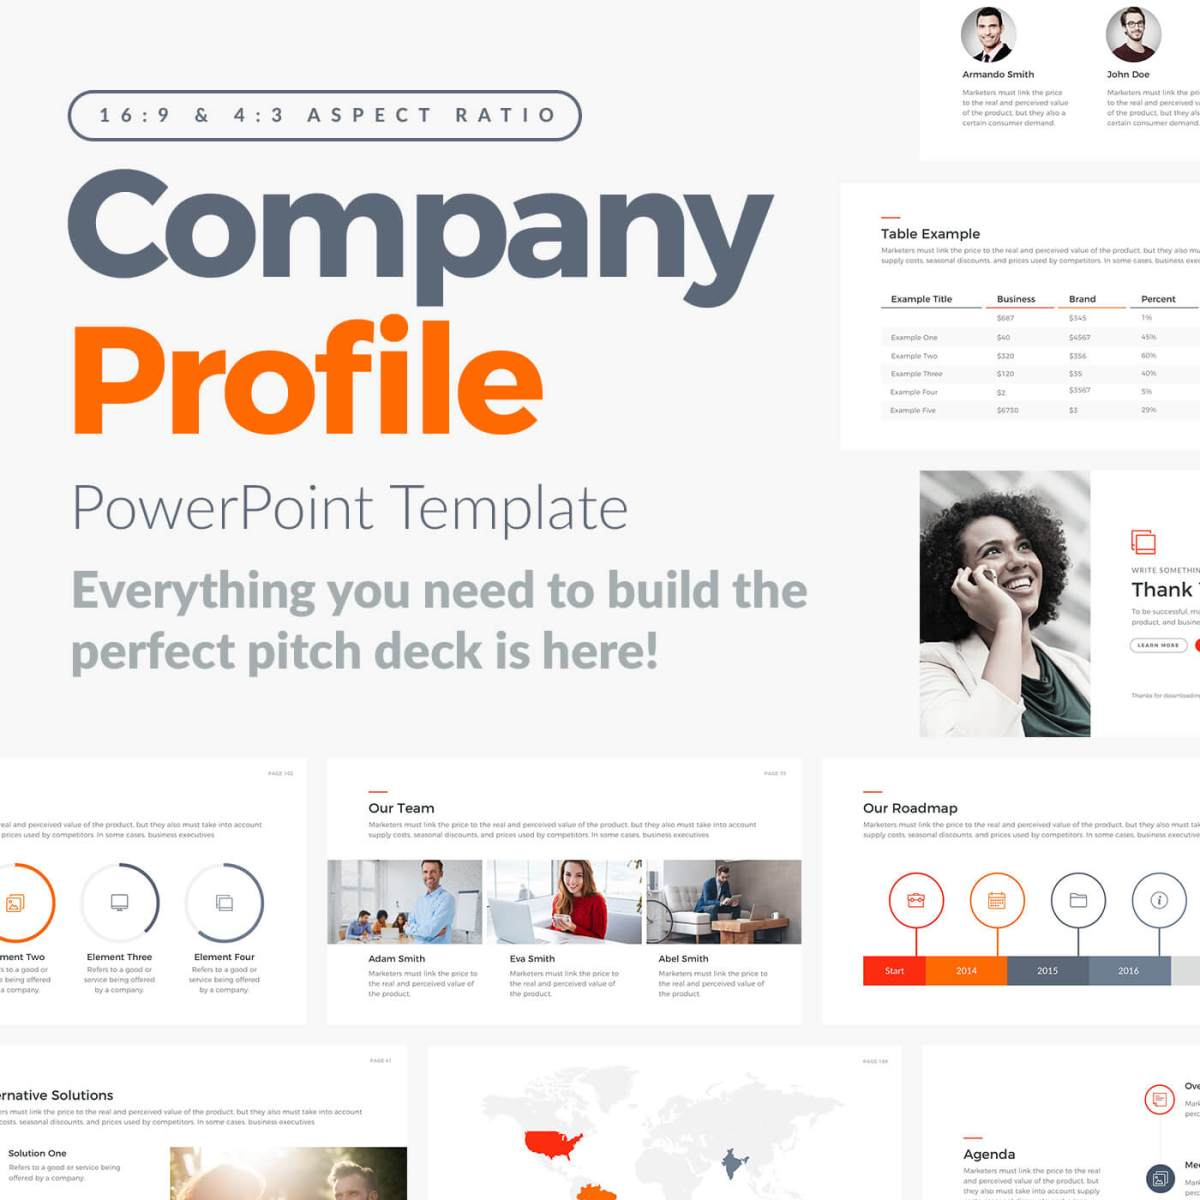 company profile presentation powerpoint template pptx